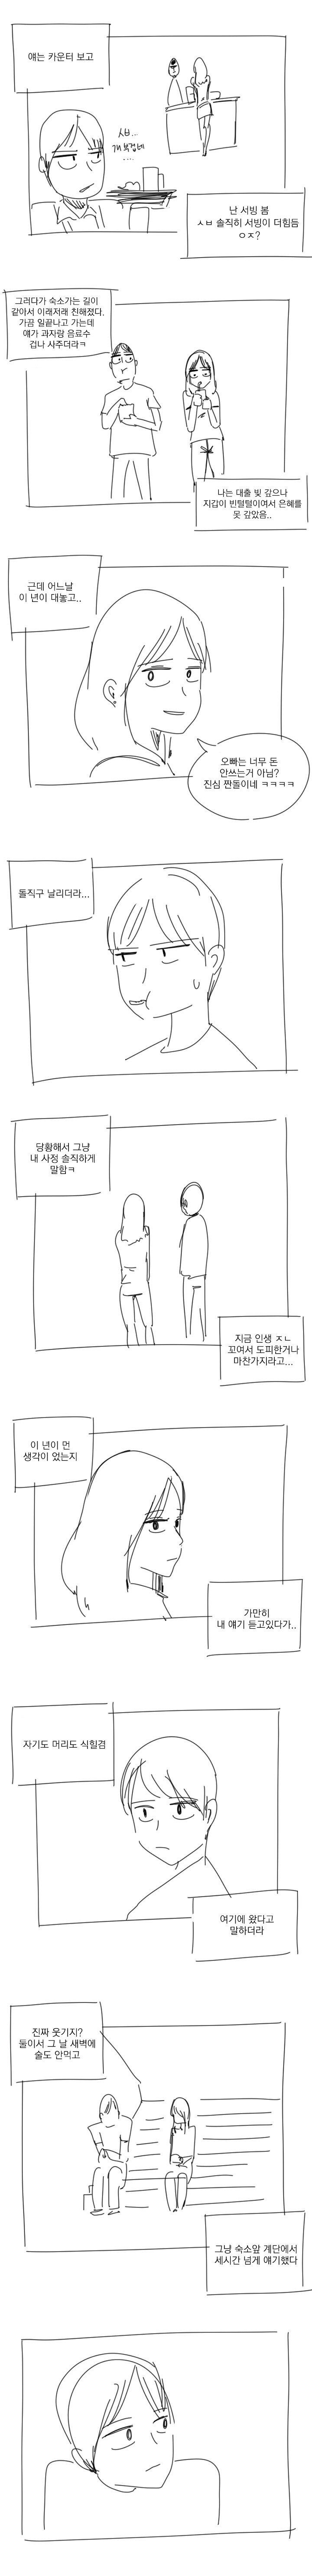 2.jpg ㅎㅂ) 노래방도우미랑 사귄 썰 [manwa]